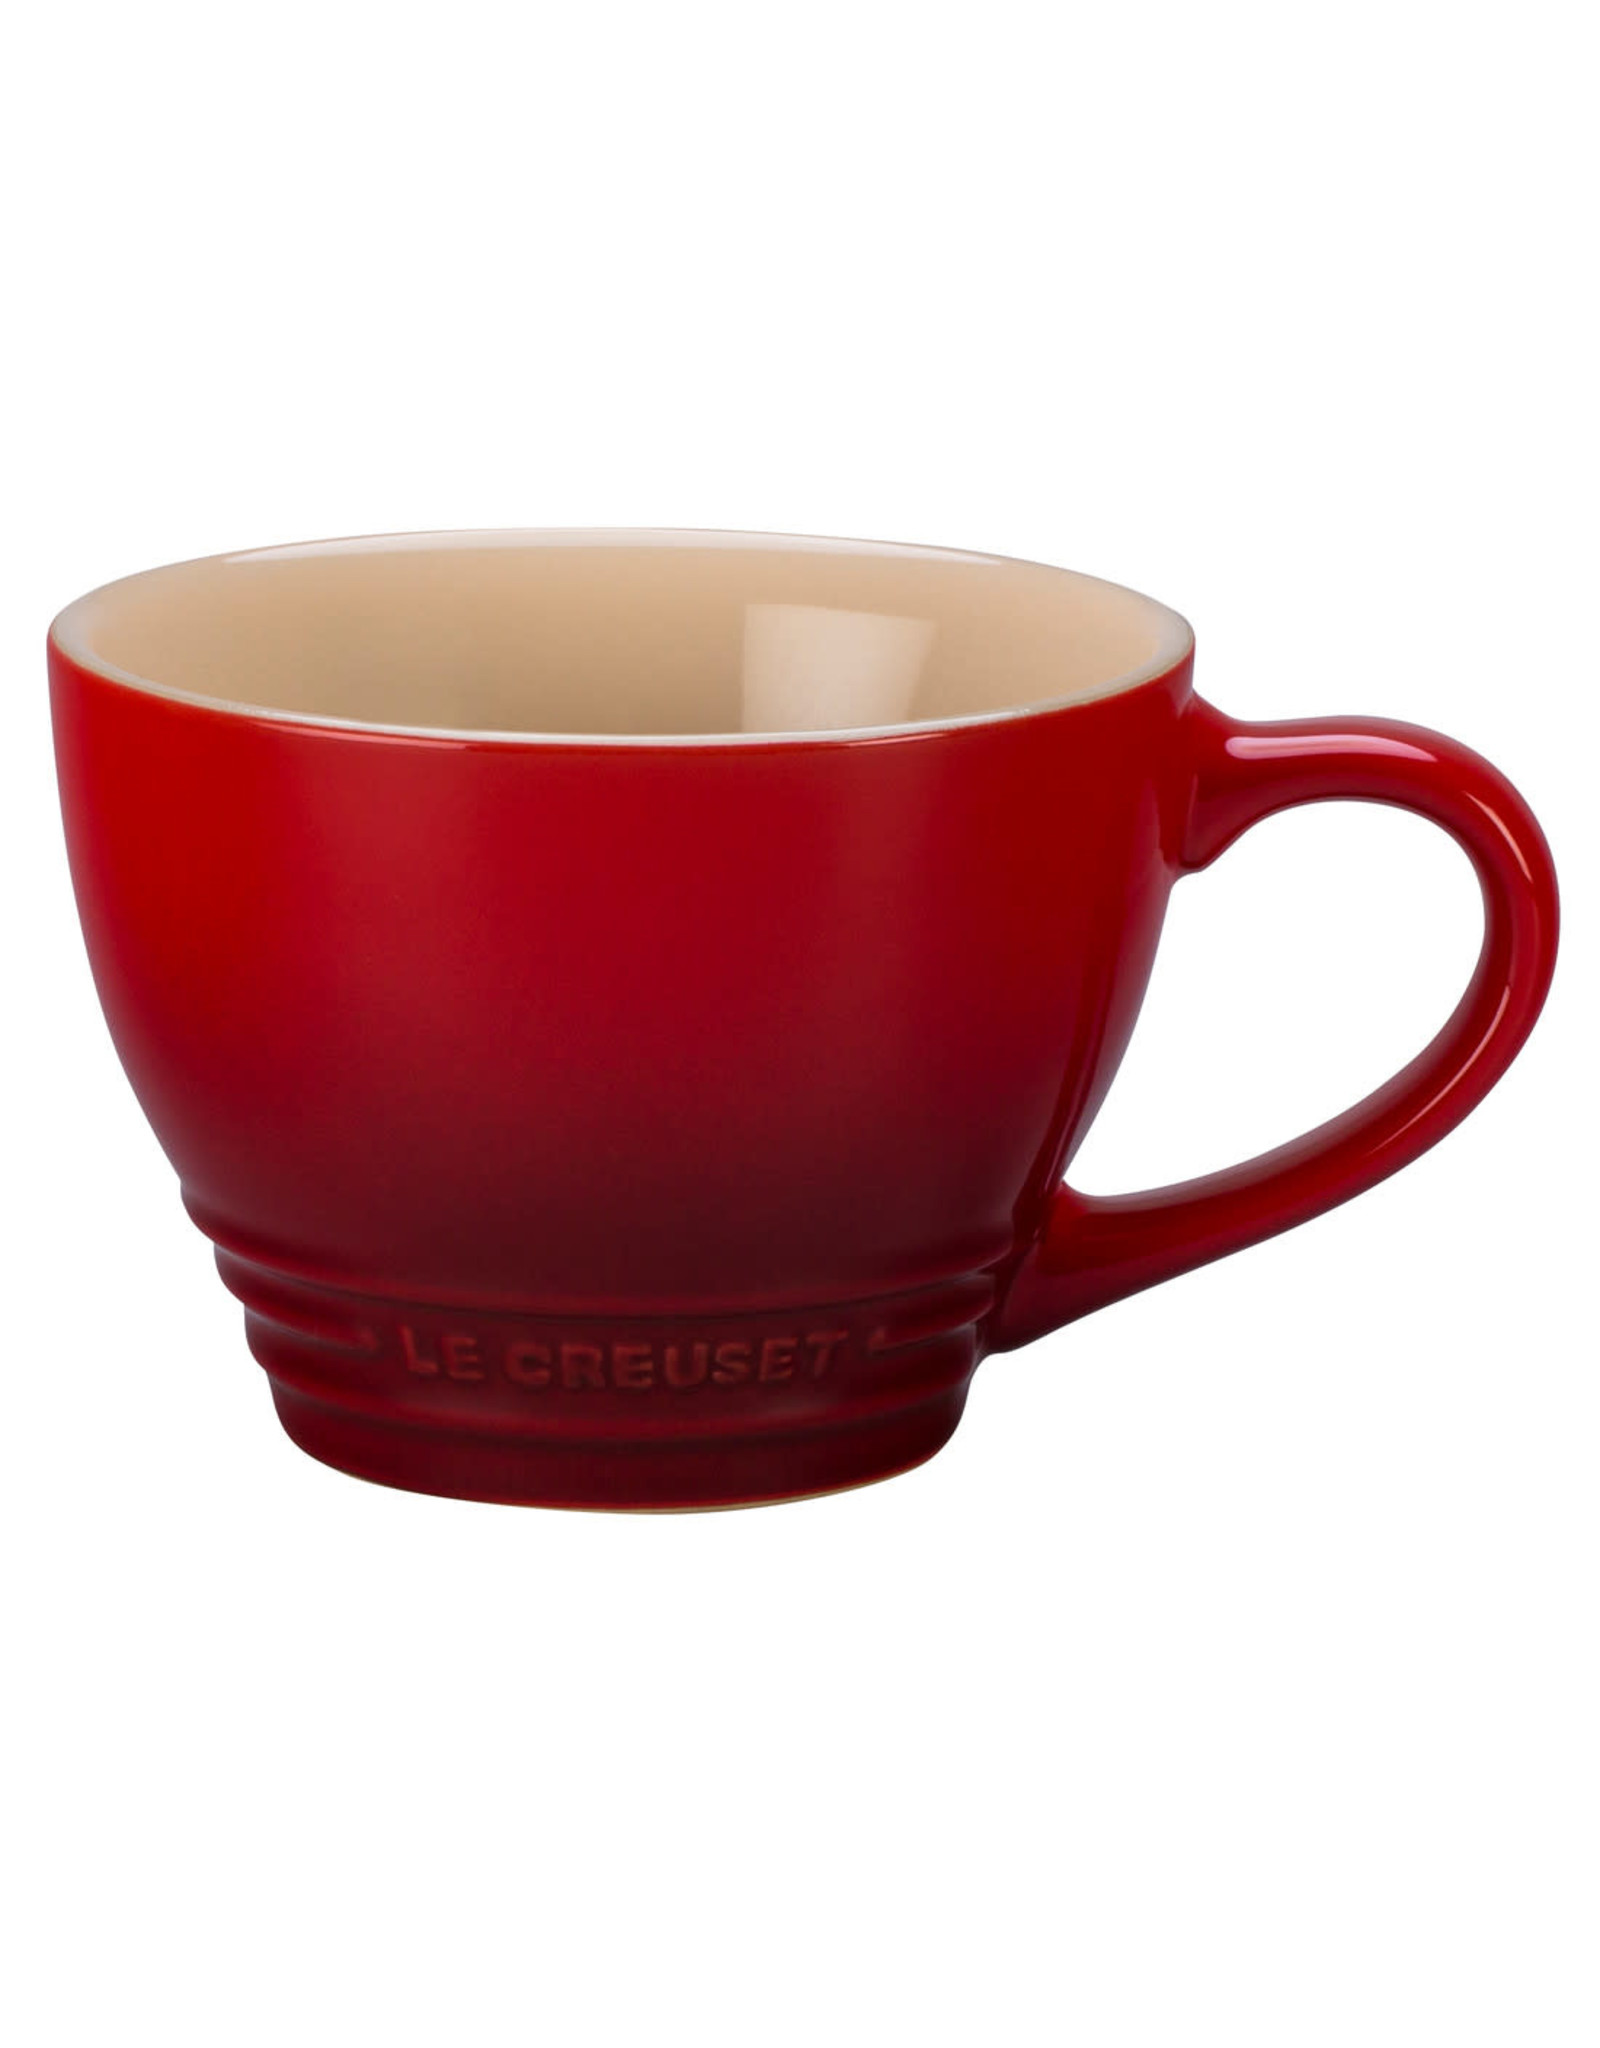 Le Creuset Le Creuset 14oz Bistro Mug - Cerise